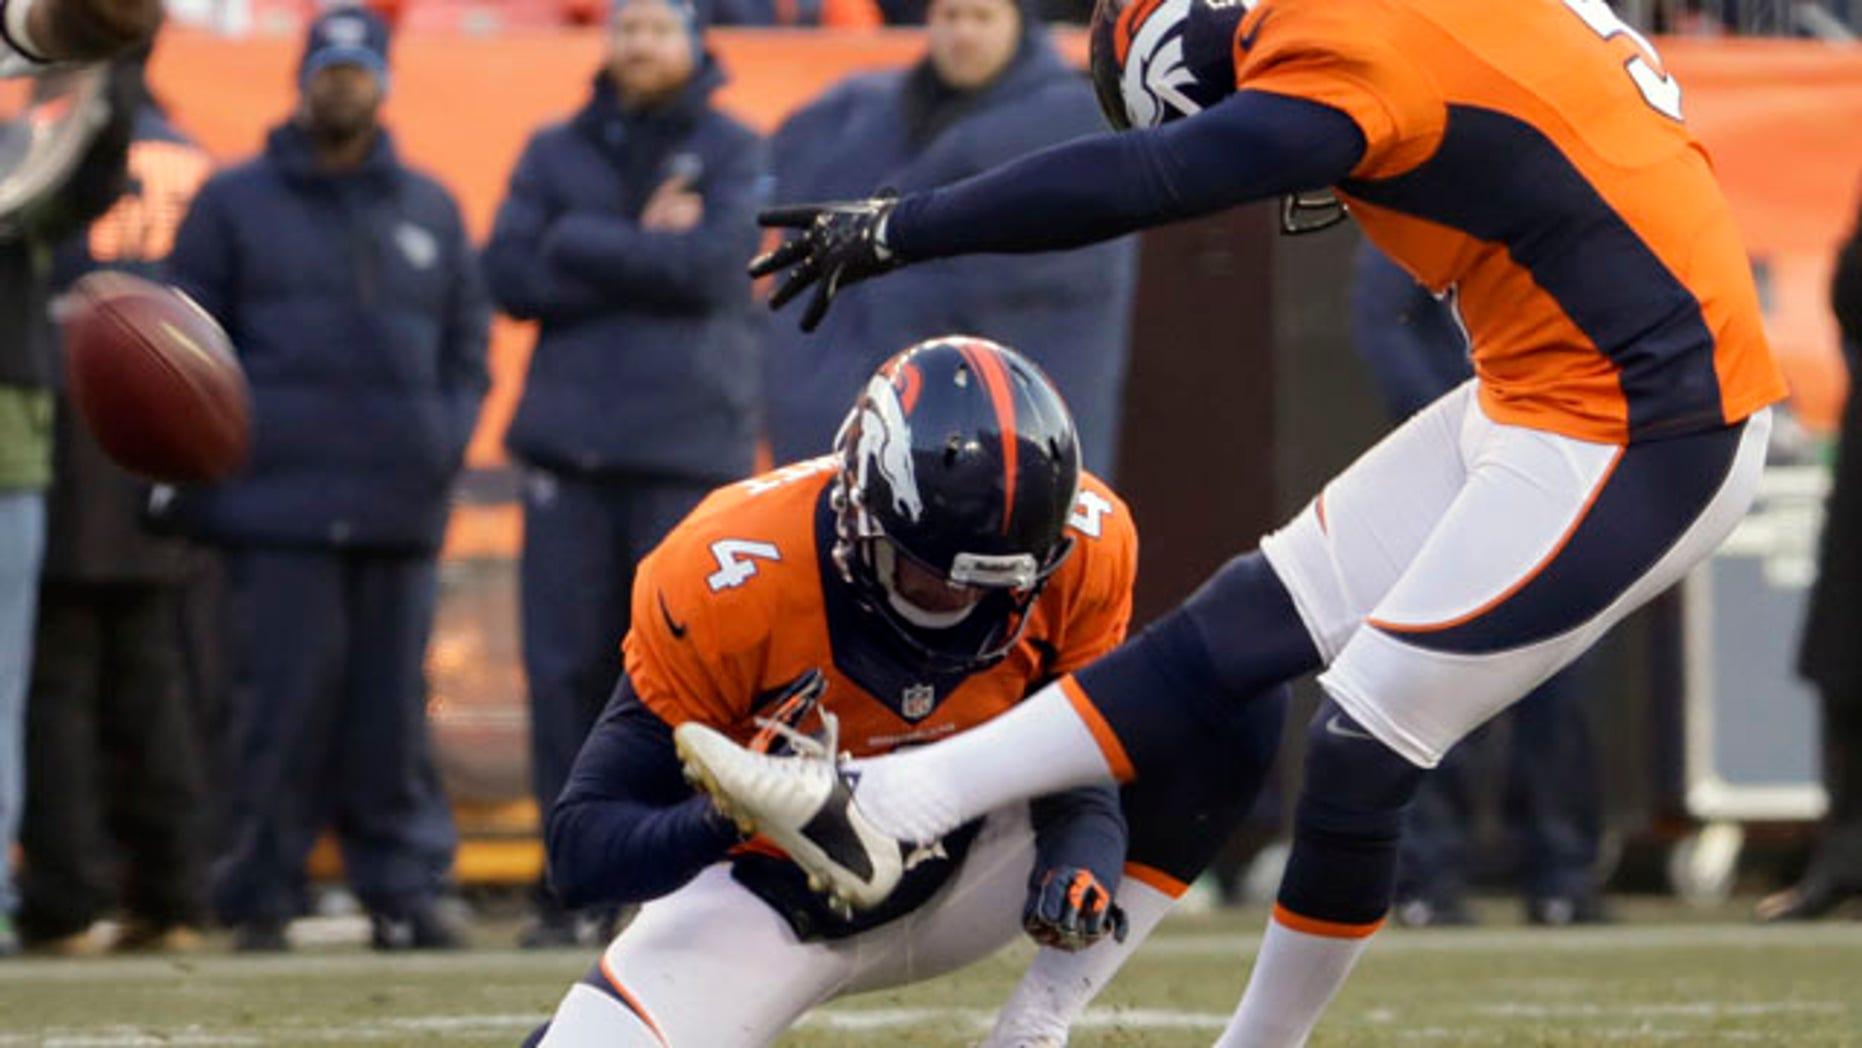 Dec. 8, 2013: Denver Broncos kicker Matt Prater, right, kicks a 64-yard field goal as Britton Colquitt holds during the first half of an NFL football game against the Tennessee Titans.